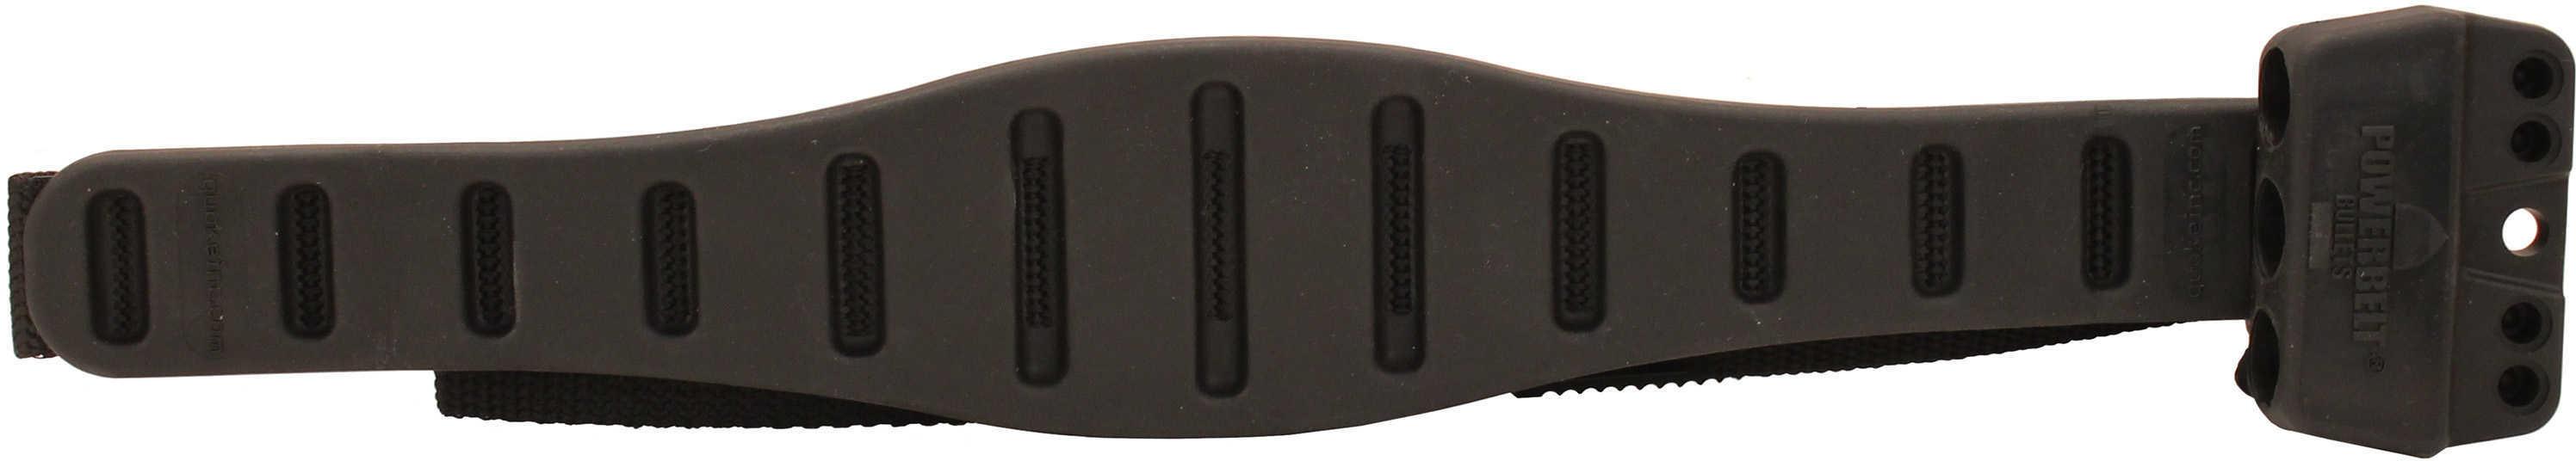 Quake Muzzleloader Claw Sling, Black Md: 54000-7